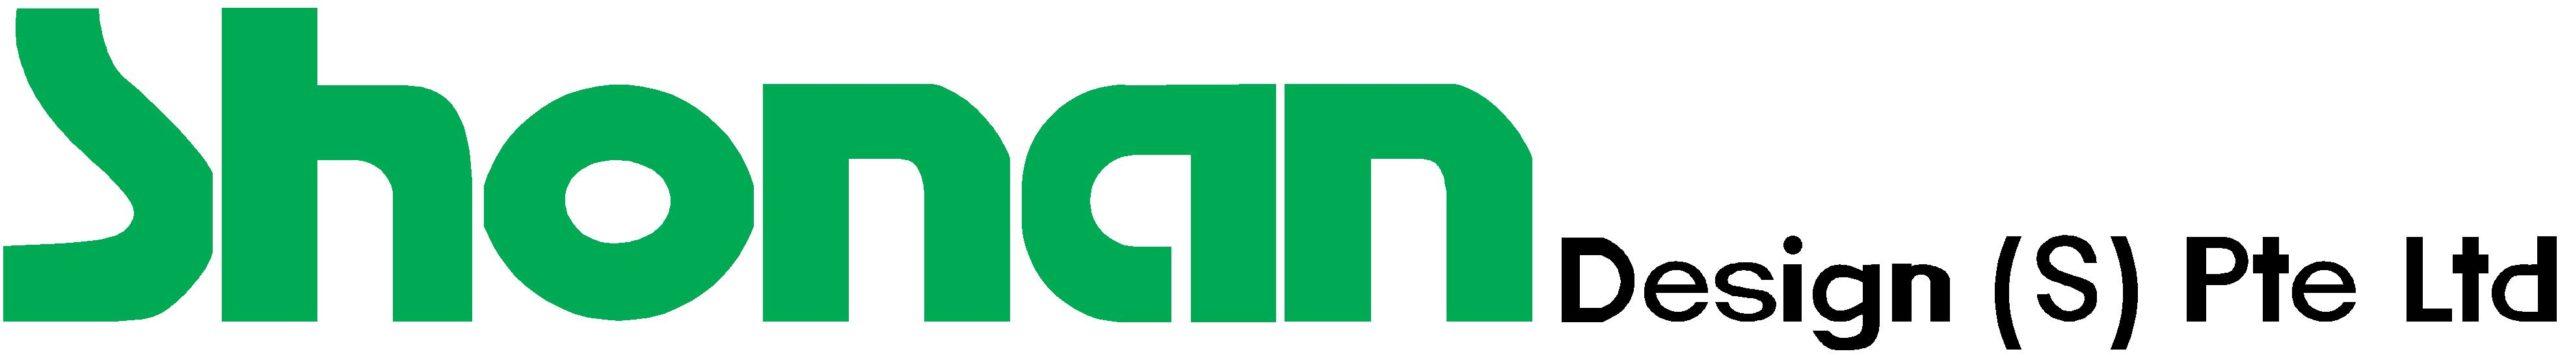 Shonan-logo-scaled-1-1-2-1-2-1-1-1-1-1-1-1-1-1-1-1-1-1-1-1-1-1-1-1-1-1-1-1-1-1-1-1-1-1-1-1-1-1-1-1.jpg